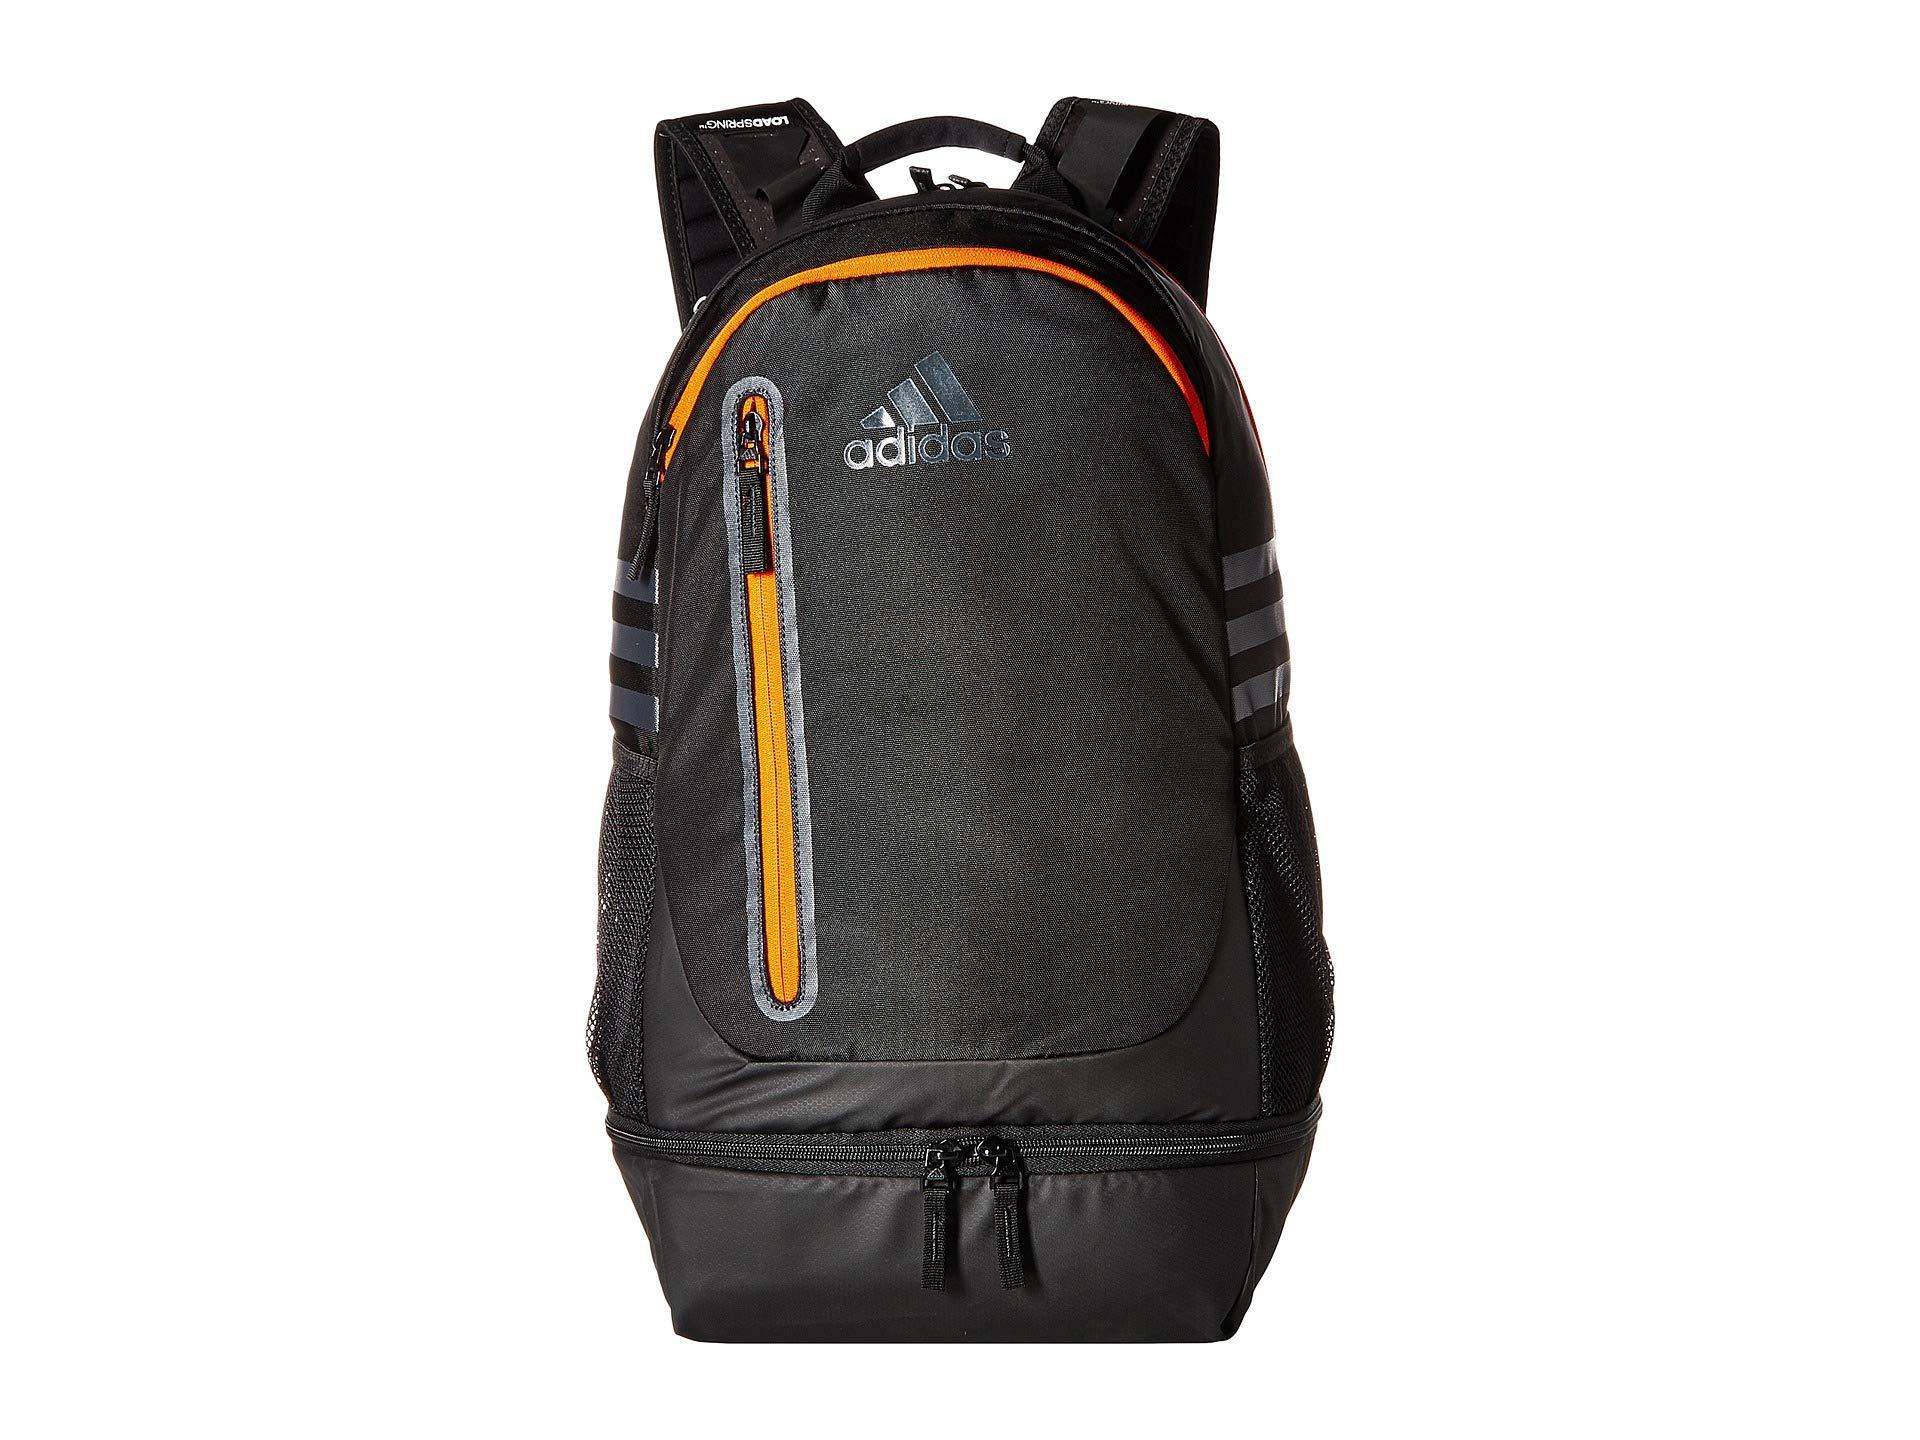 ffad4f898c43 Lyst - adidas Pivot Team Backpack in Black